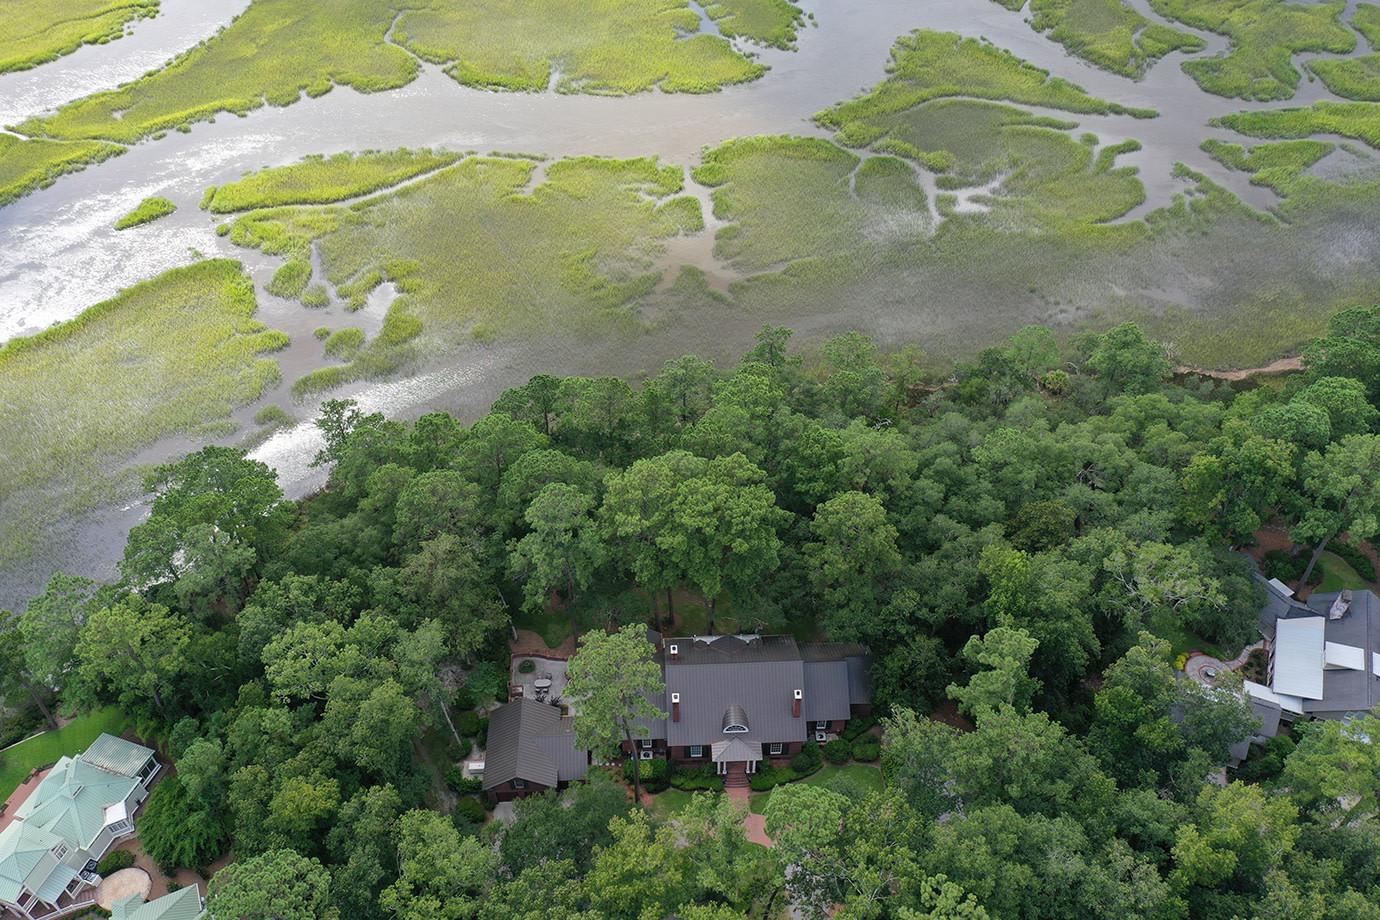 24_Goat_Island_Aerial.jpg